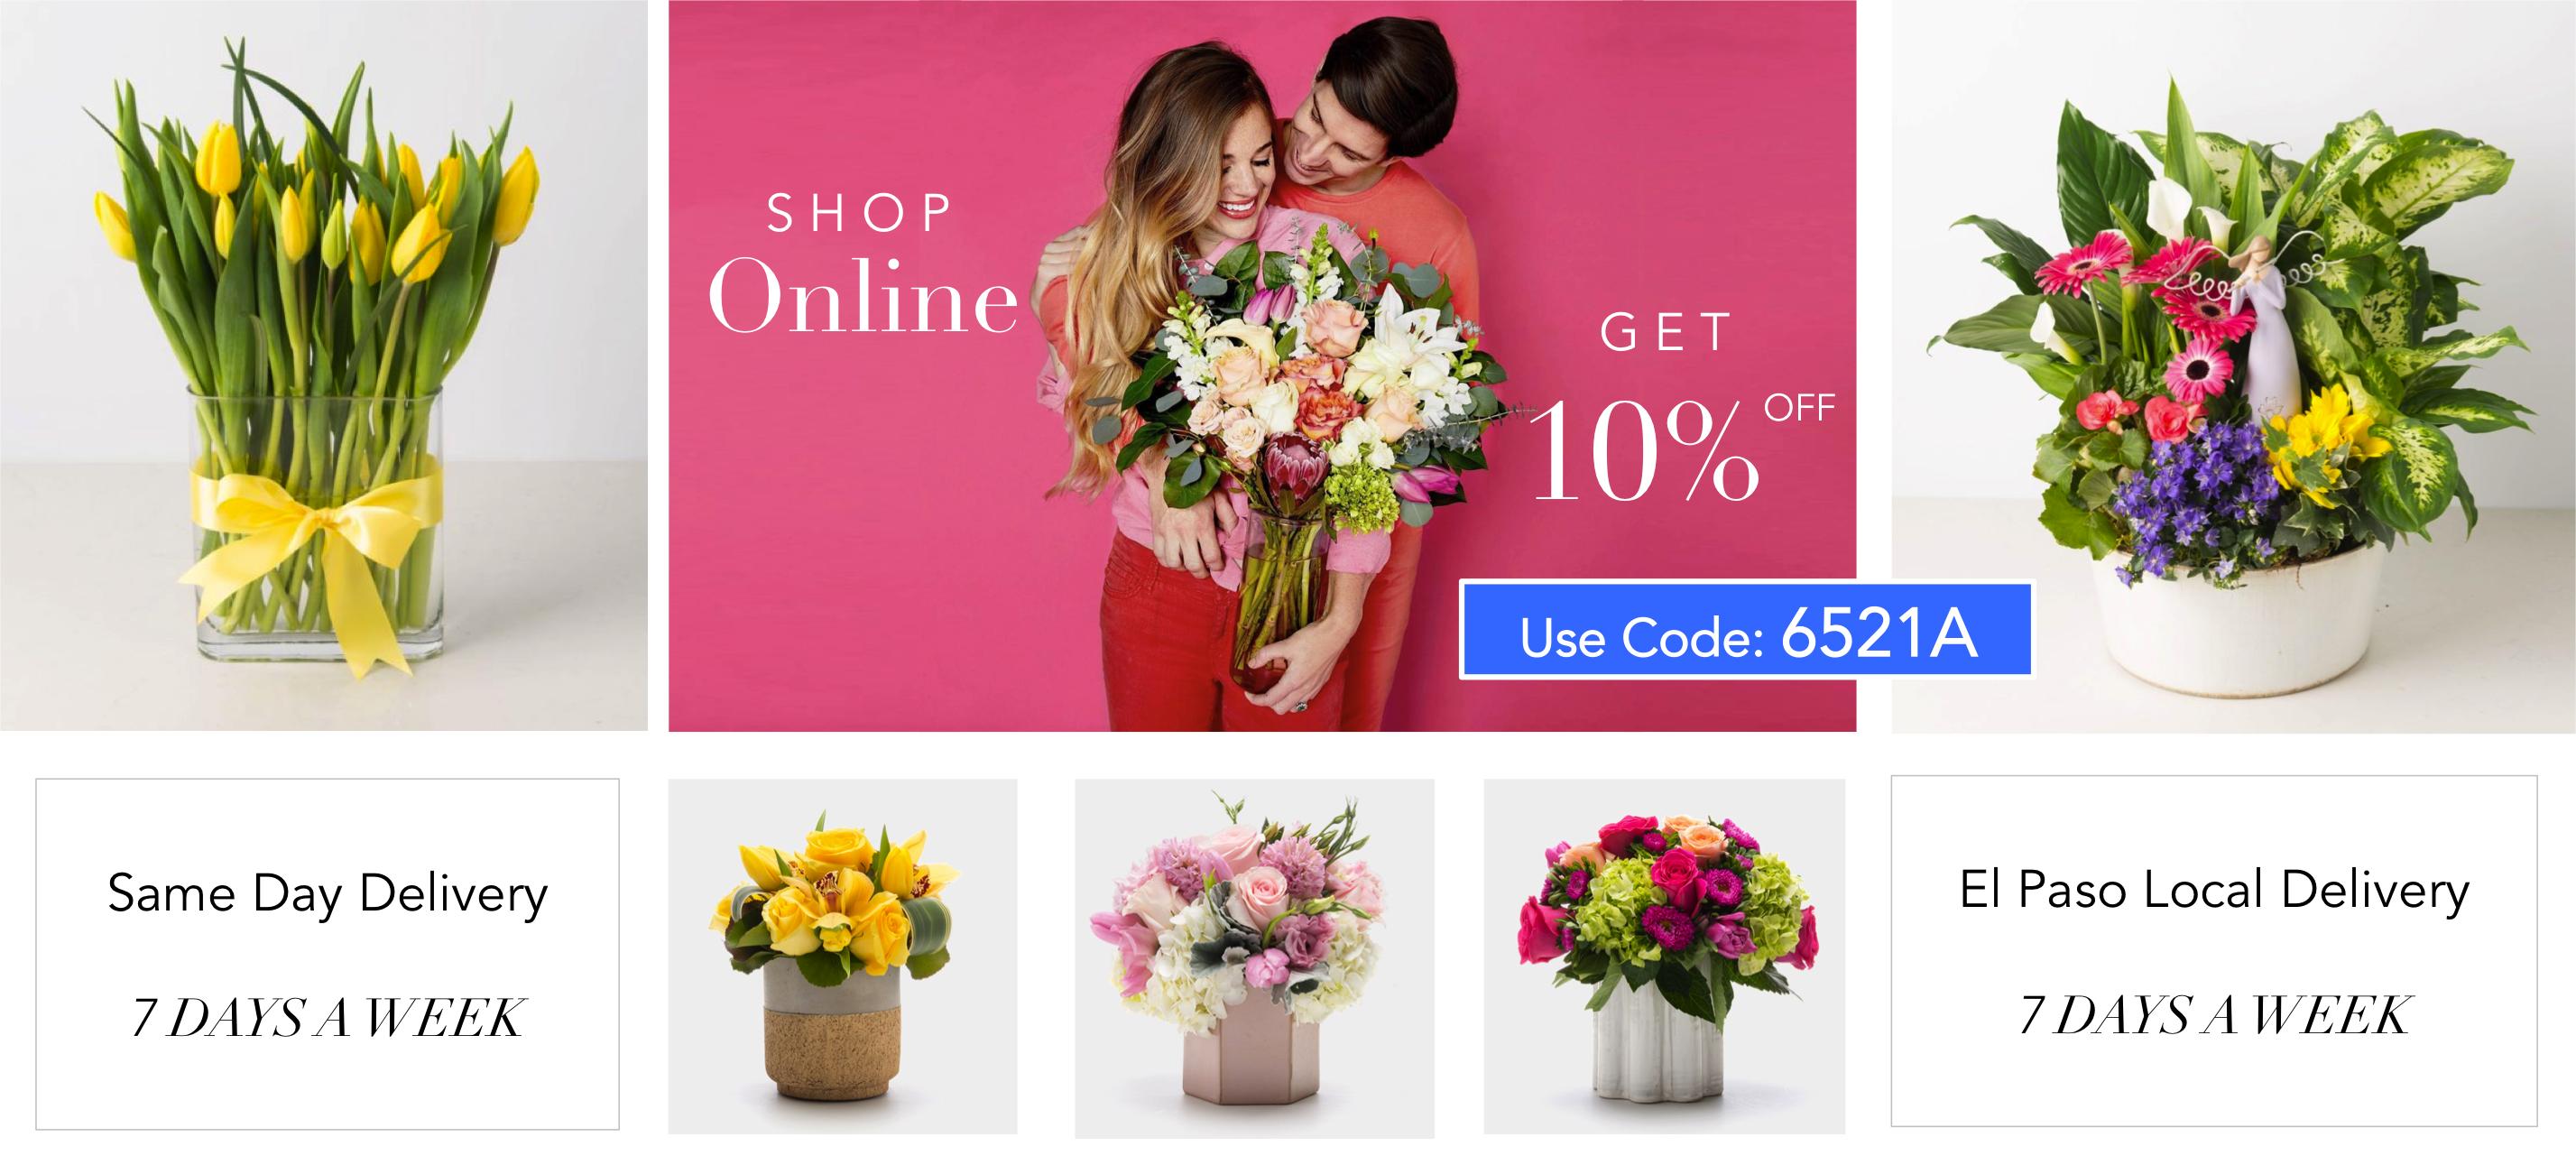 Angie s Floral Designs Best El Paso Florist in West